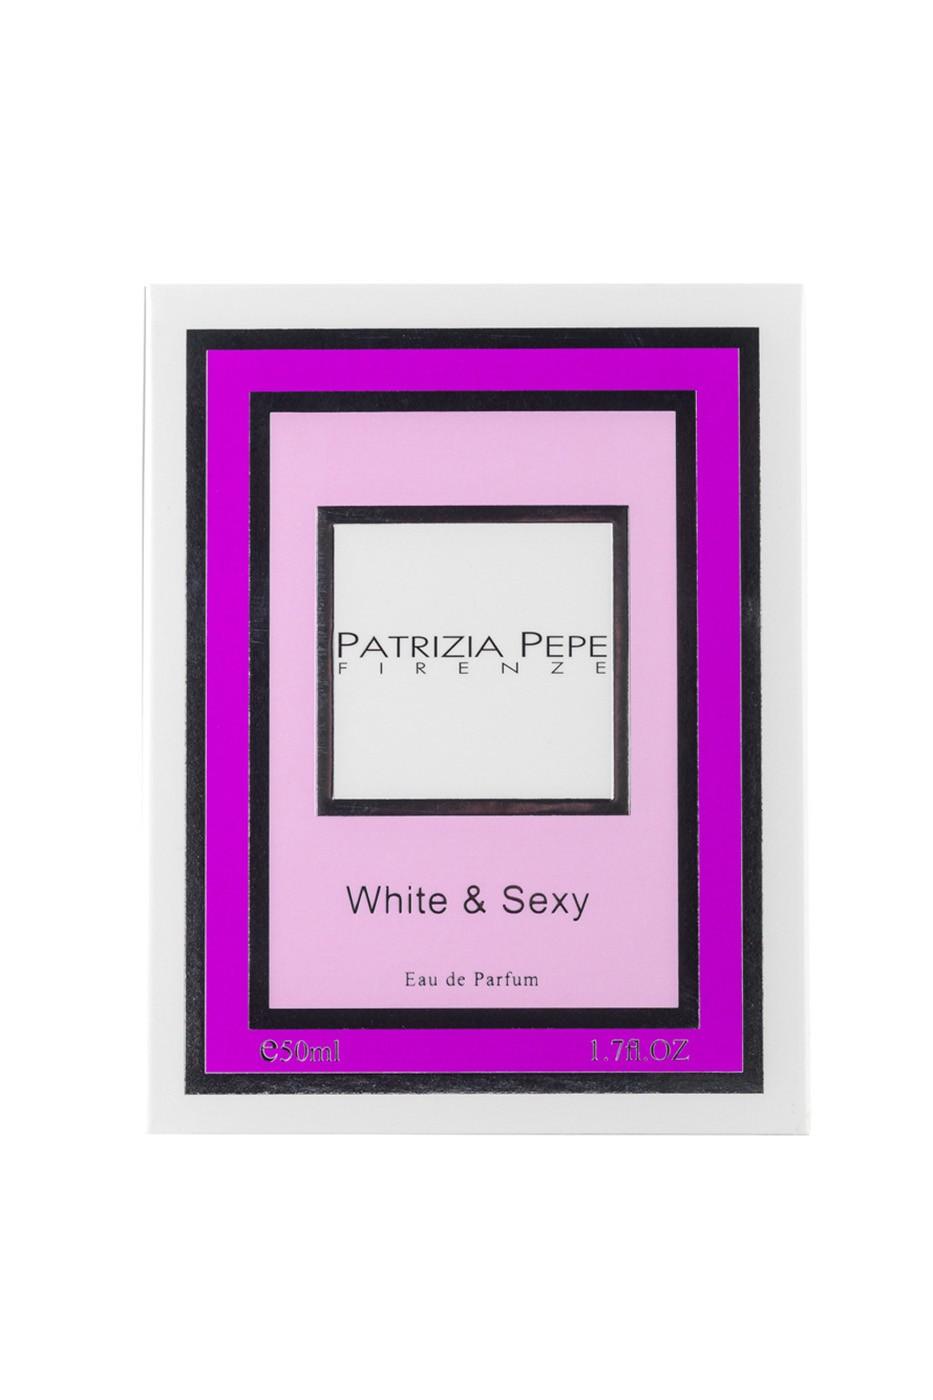 Patrizia Pepe White & Sexy аромат для женщин